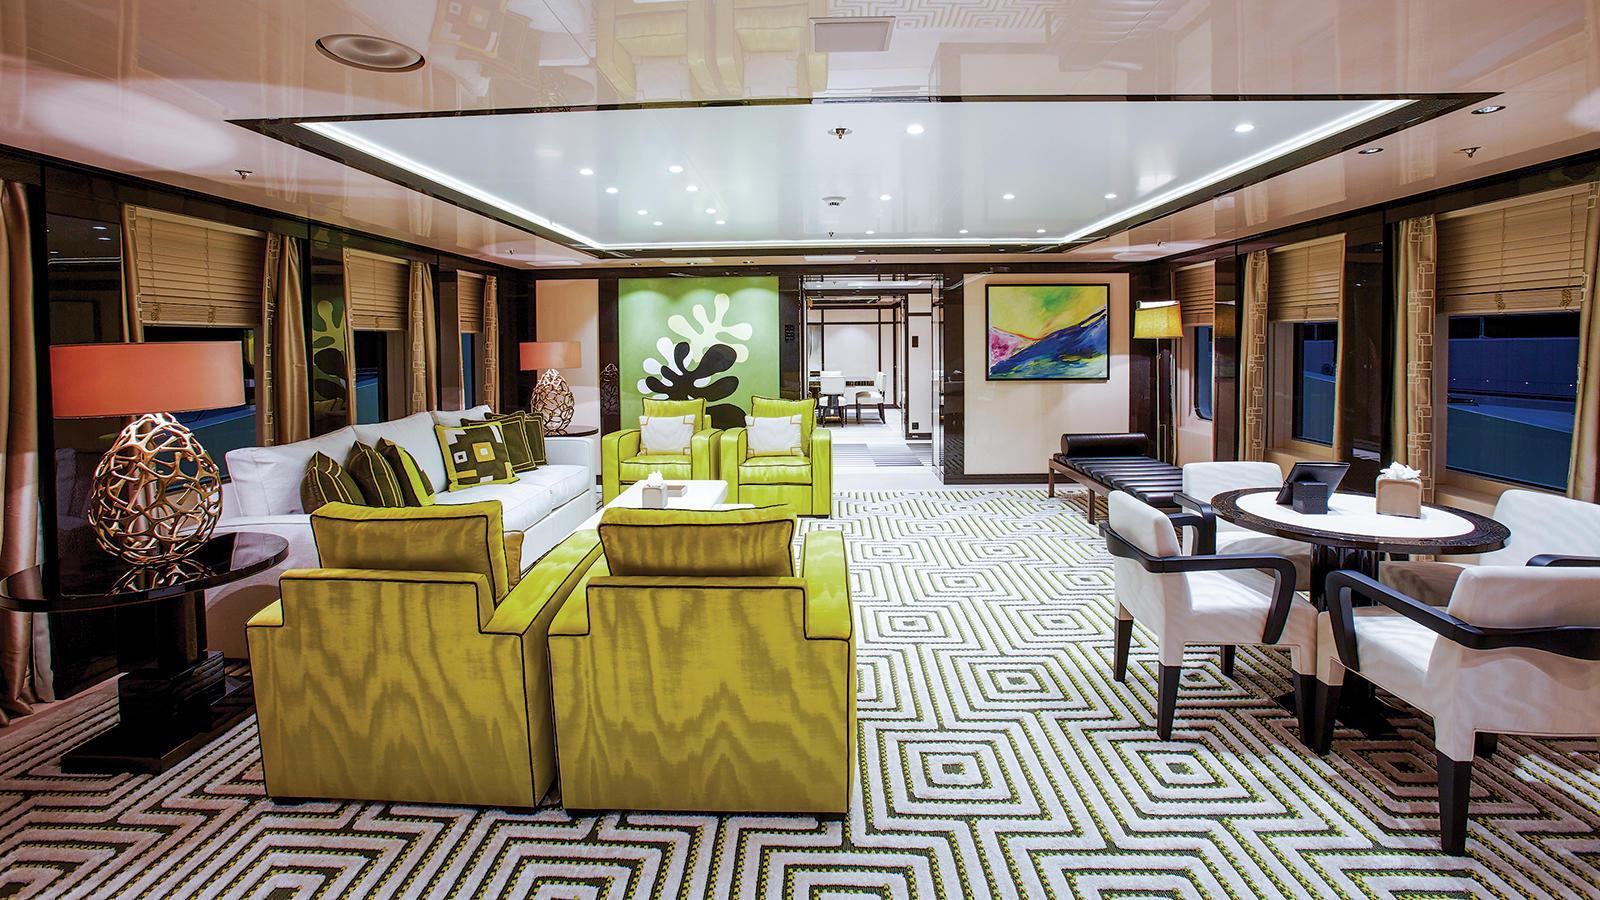 madame-kate-motor-yacht-amels-1999-62m-2015-main-saloon